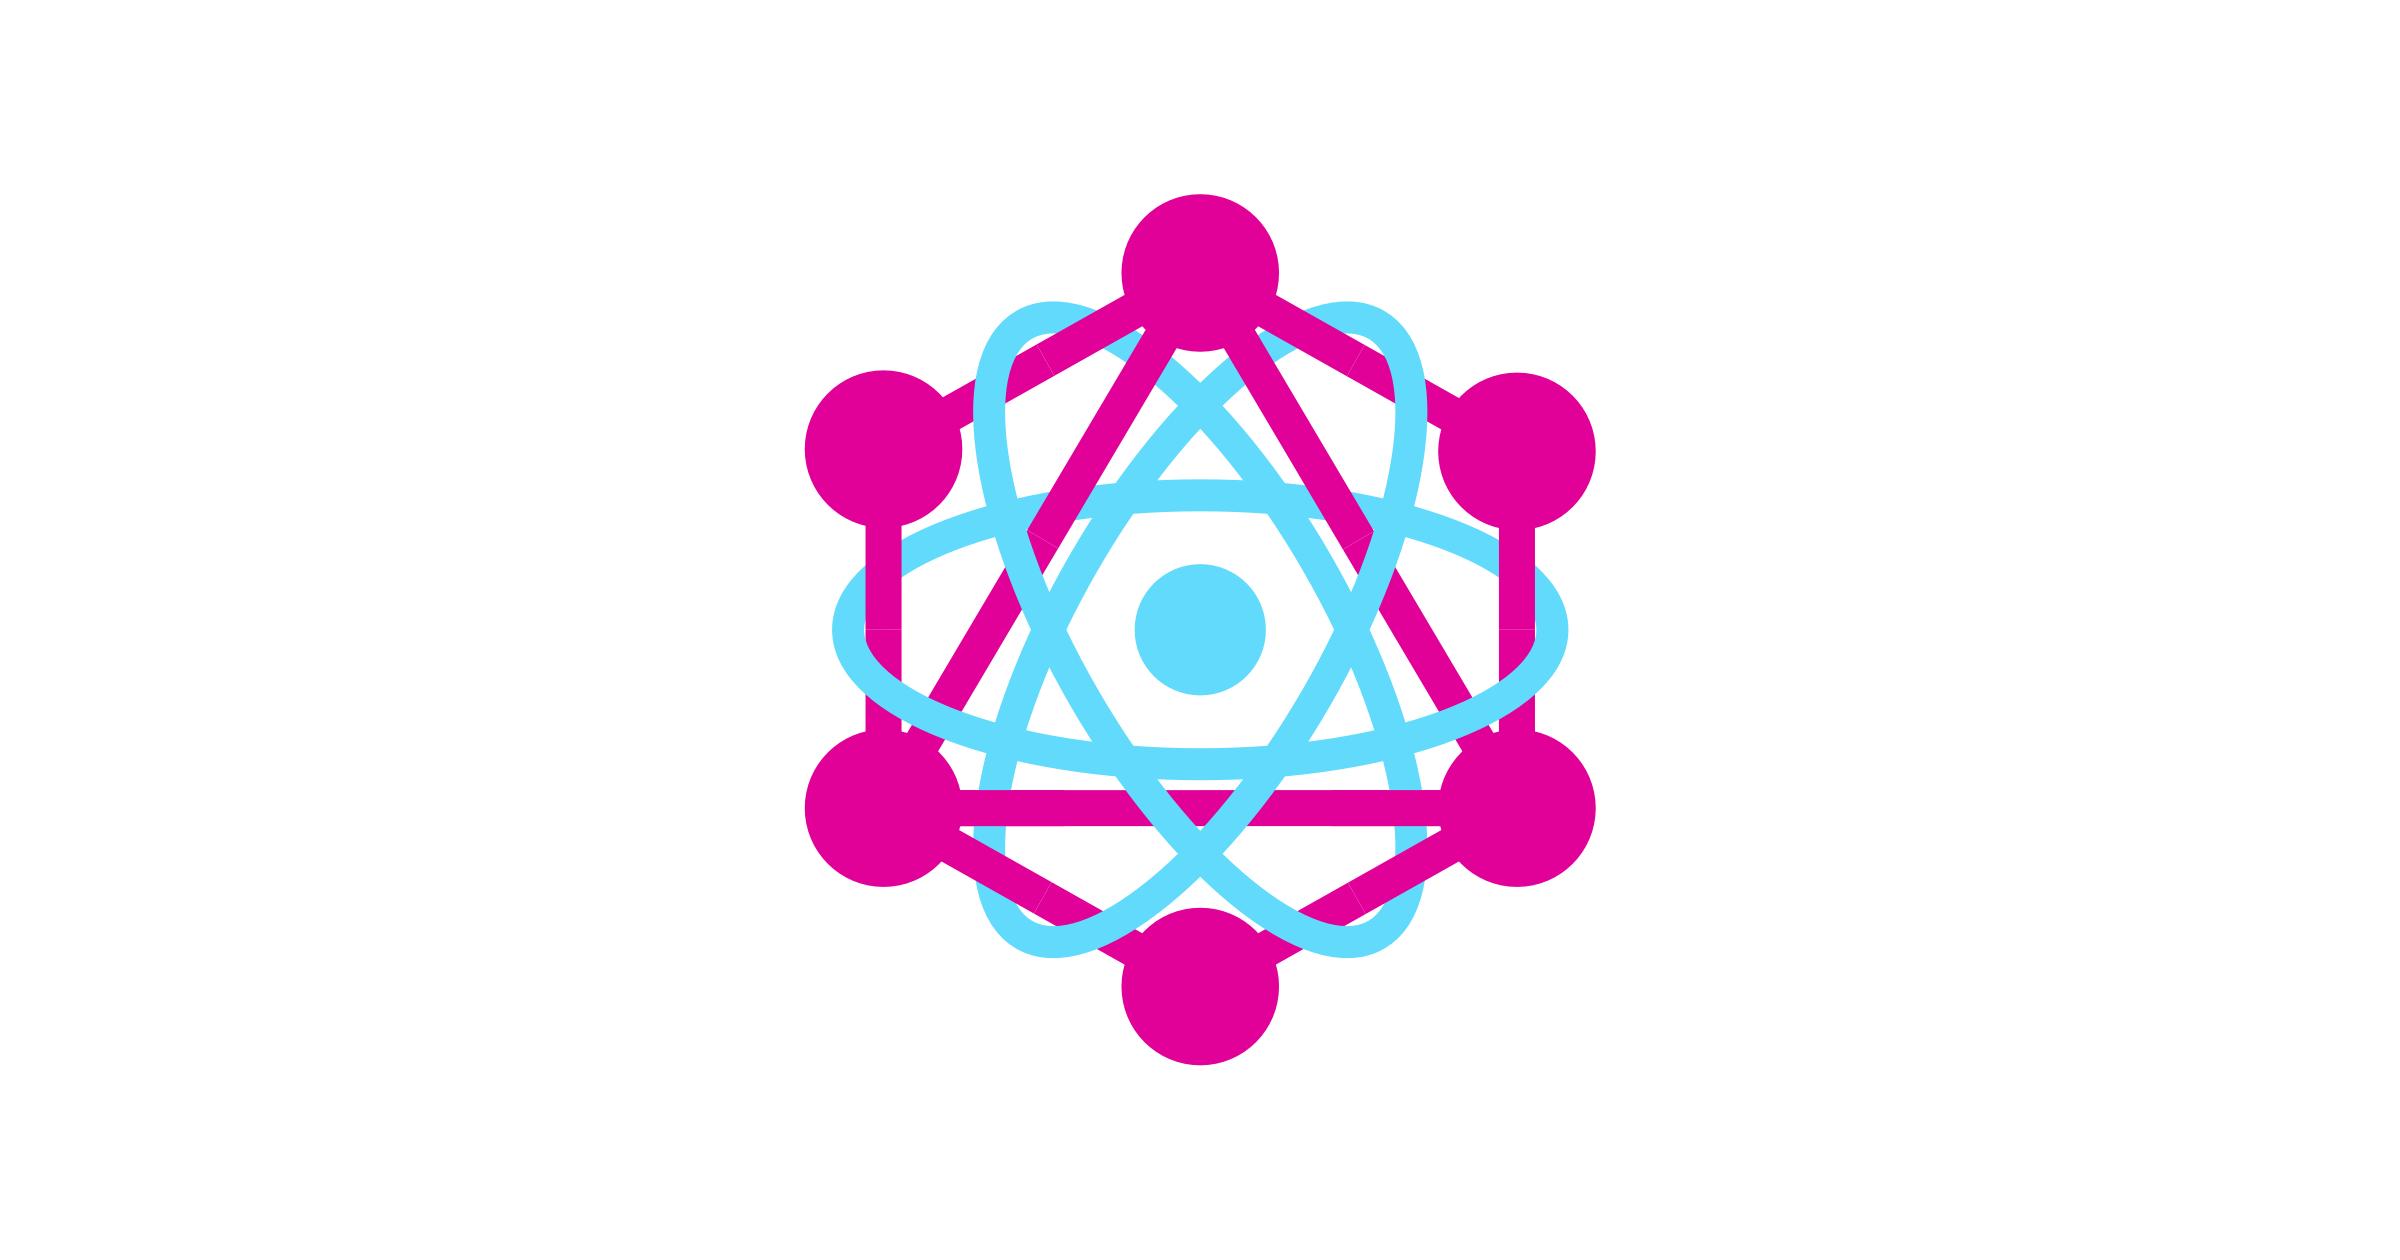 jaydenseric/graphql-react GitHub repo thumbnail.